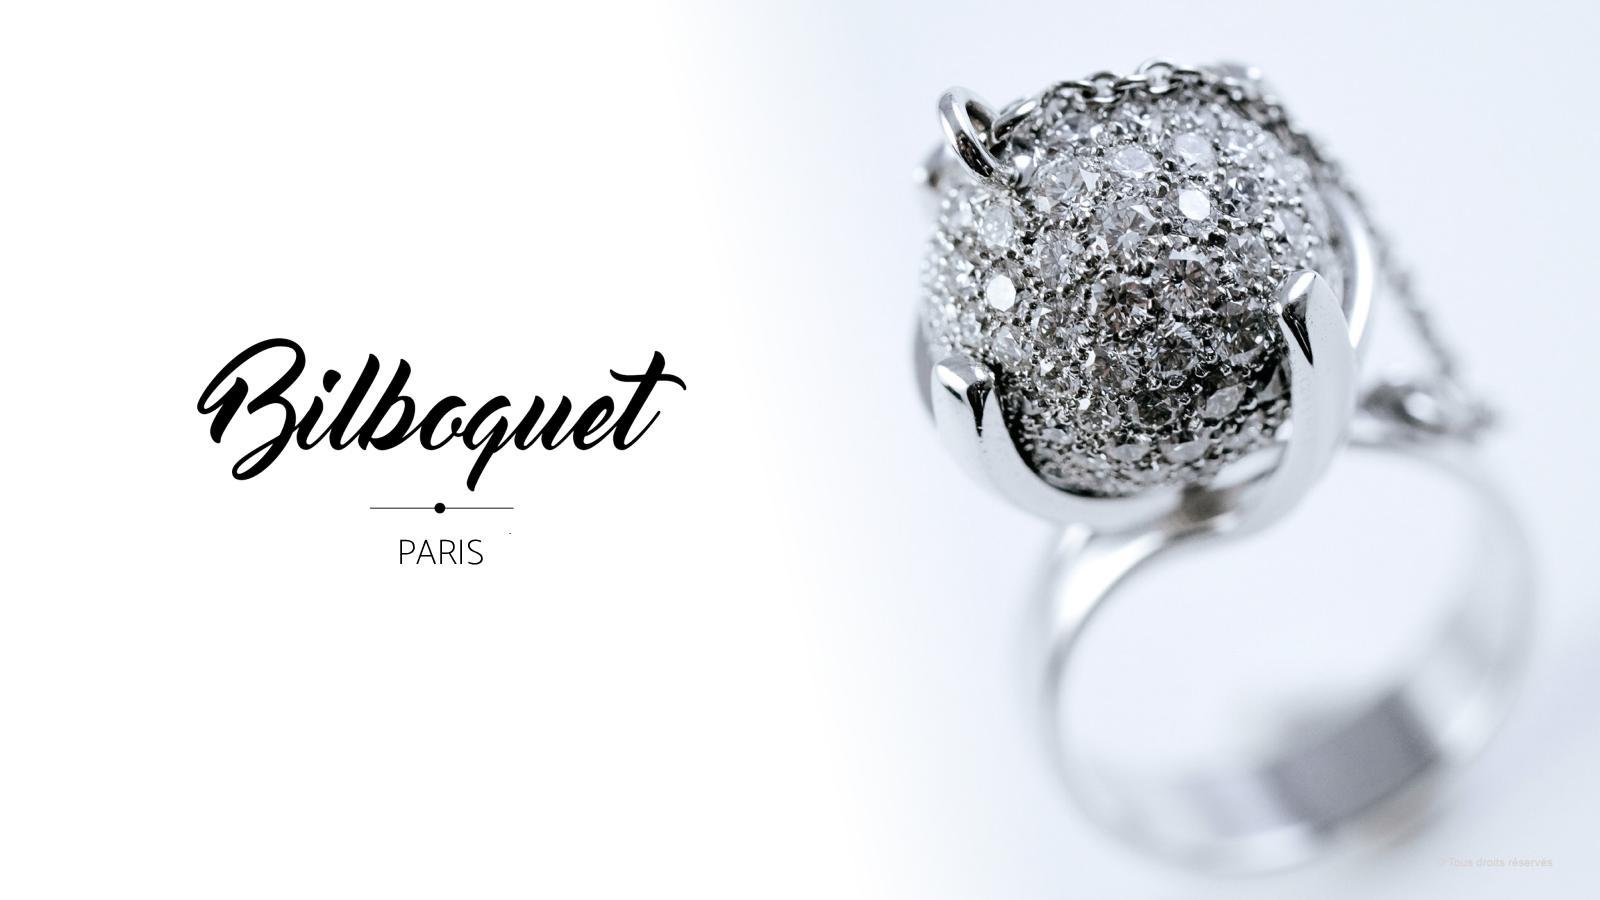 Bilboquet® Paris (English version)